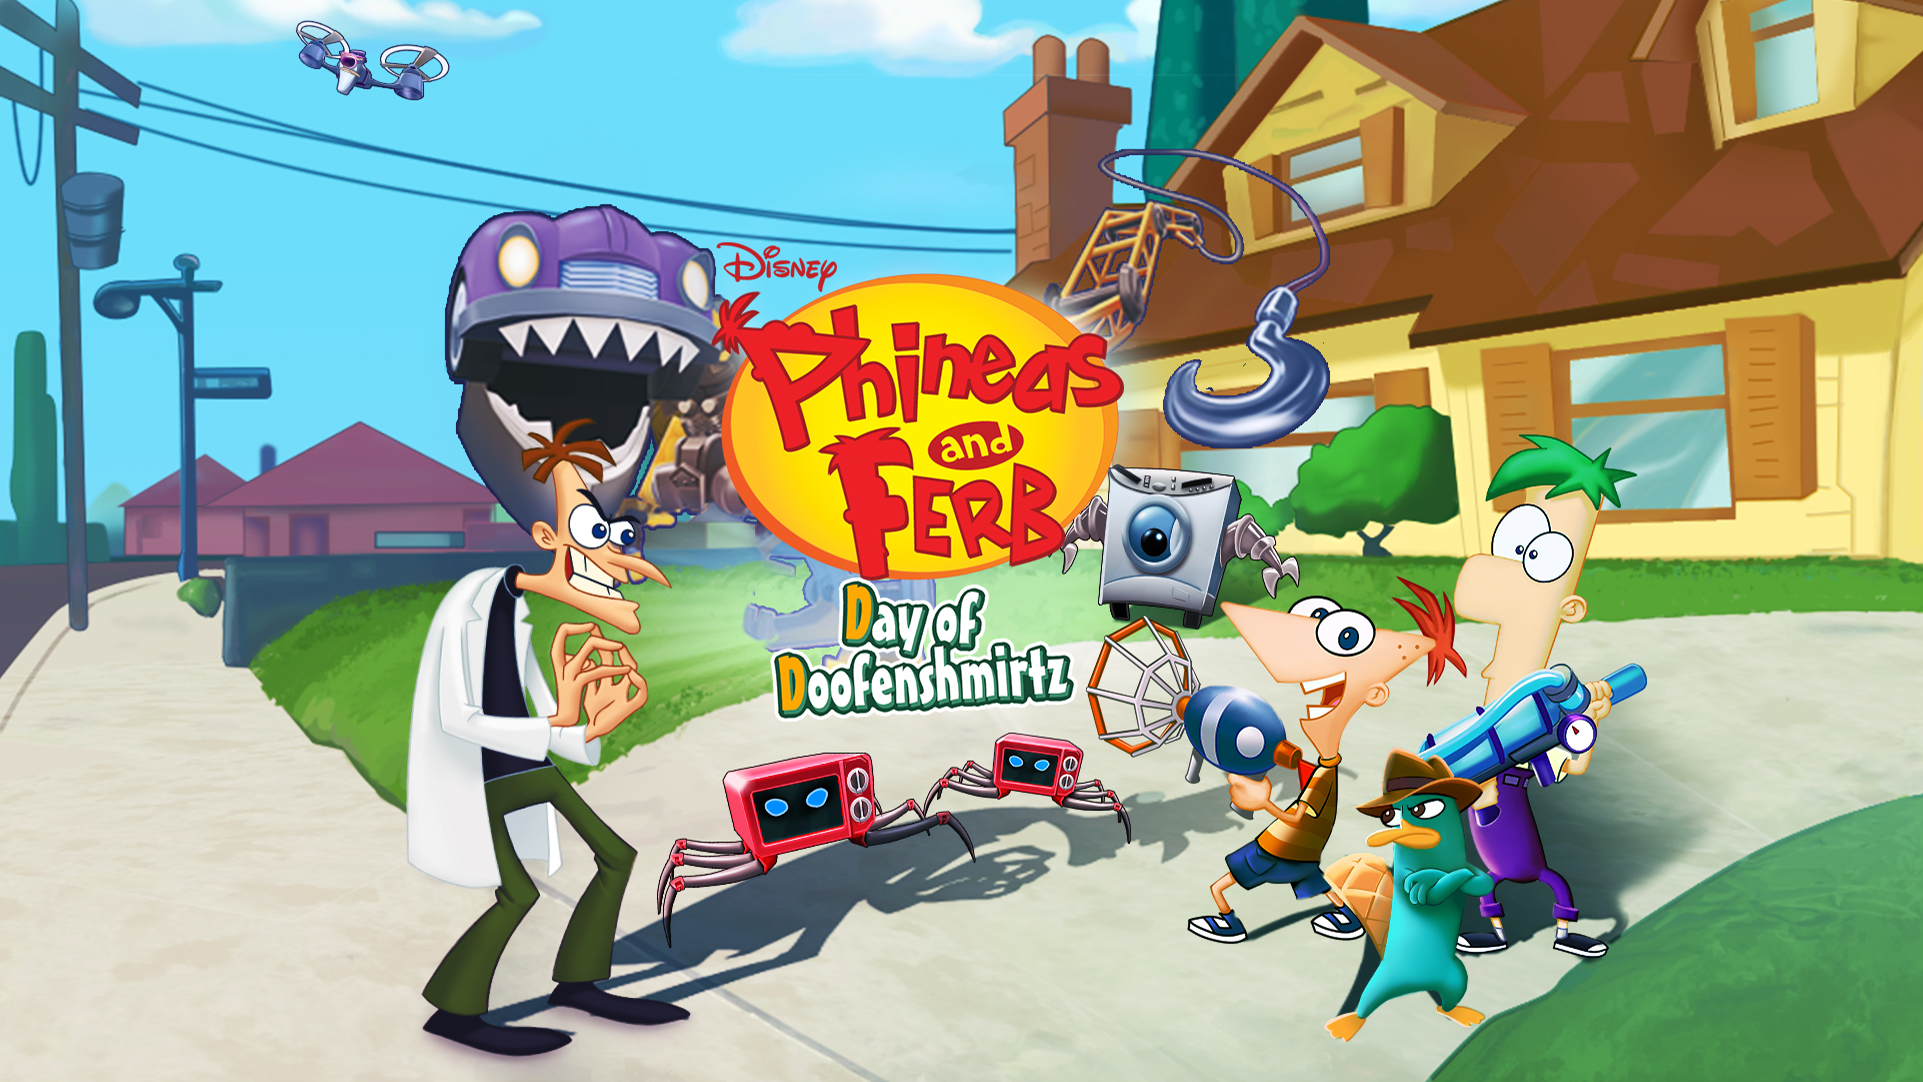 Phineas And Ferb Day Of Doofenshmirtz Game  Psvita -9945